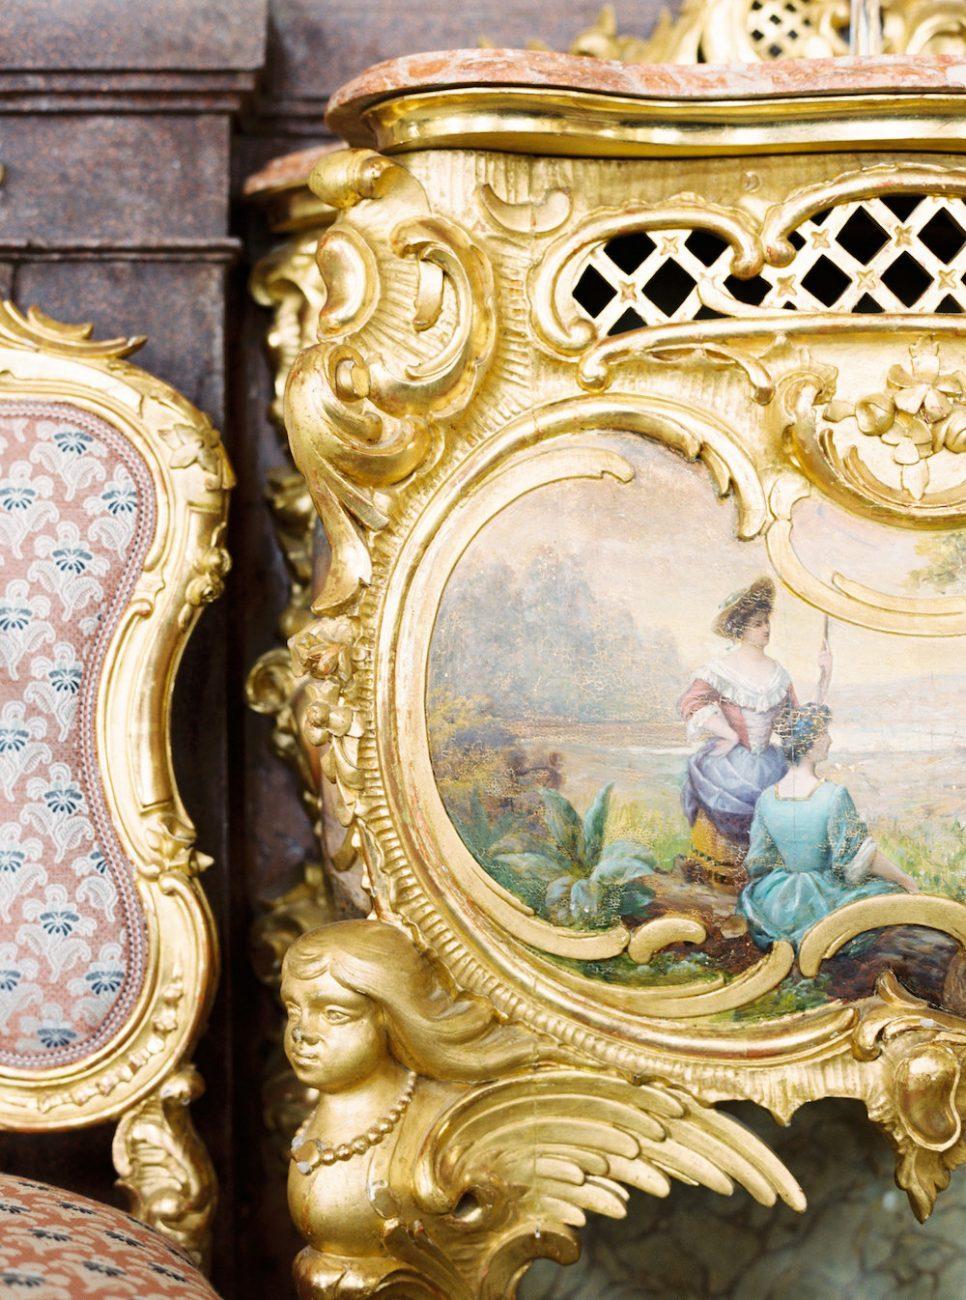 Palace Wedding Inspiration - gold ornate furniture